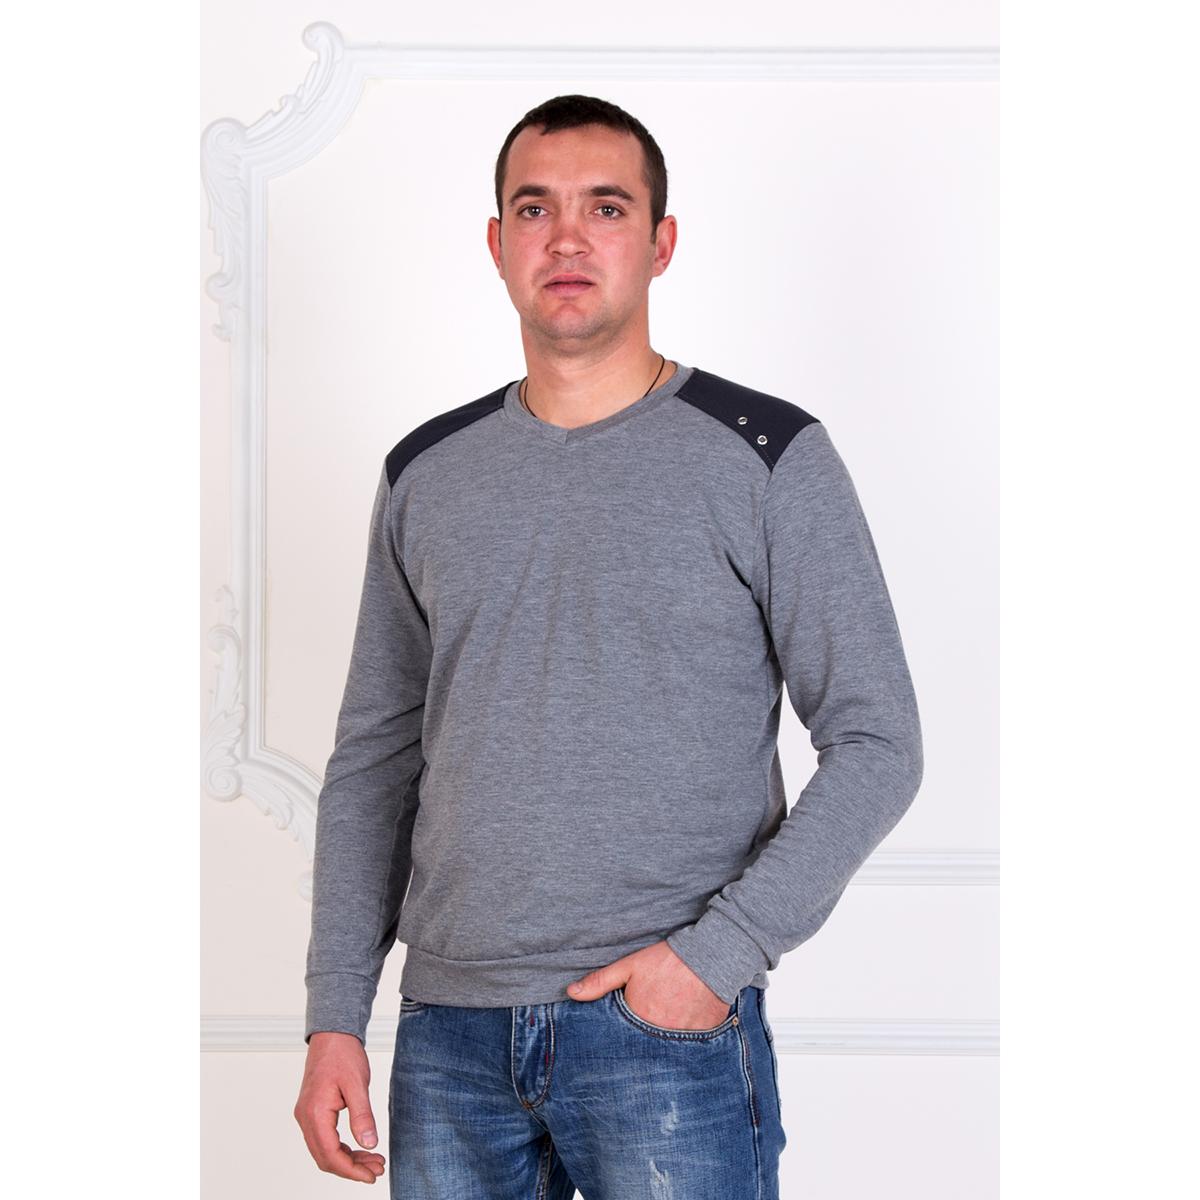 Мужской джемпер «Норд», размер 46Толстовки, джемпера и рубашки<br>Обхват груди:92 см<br>Обхват талии:84 см<br>Обхват бедер:100 см<br>Рост:172-180 см<br><br>Тип: Муж. кофта<br>Размер: 46<br>Материал: Трикотаж